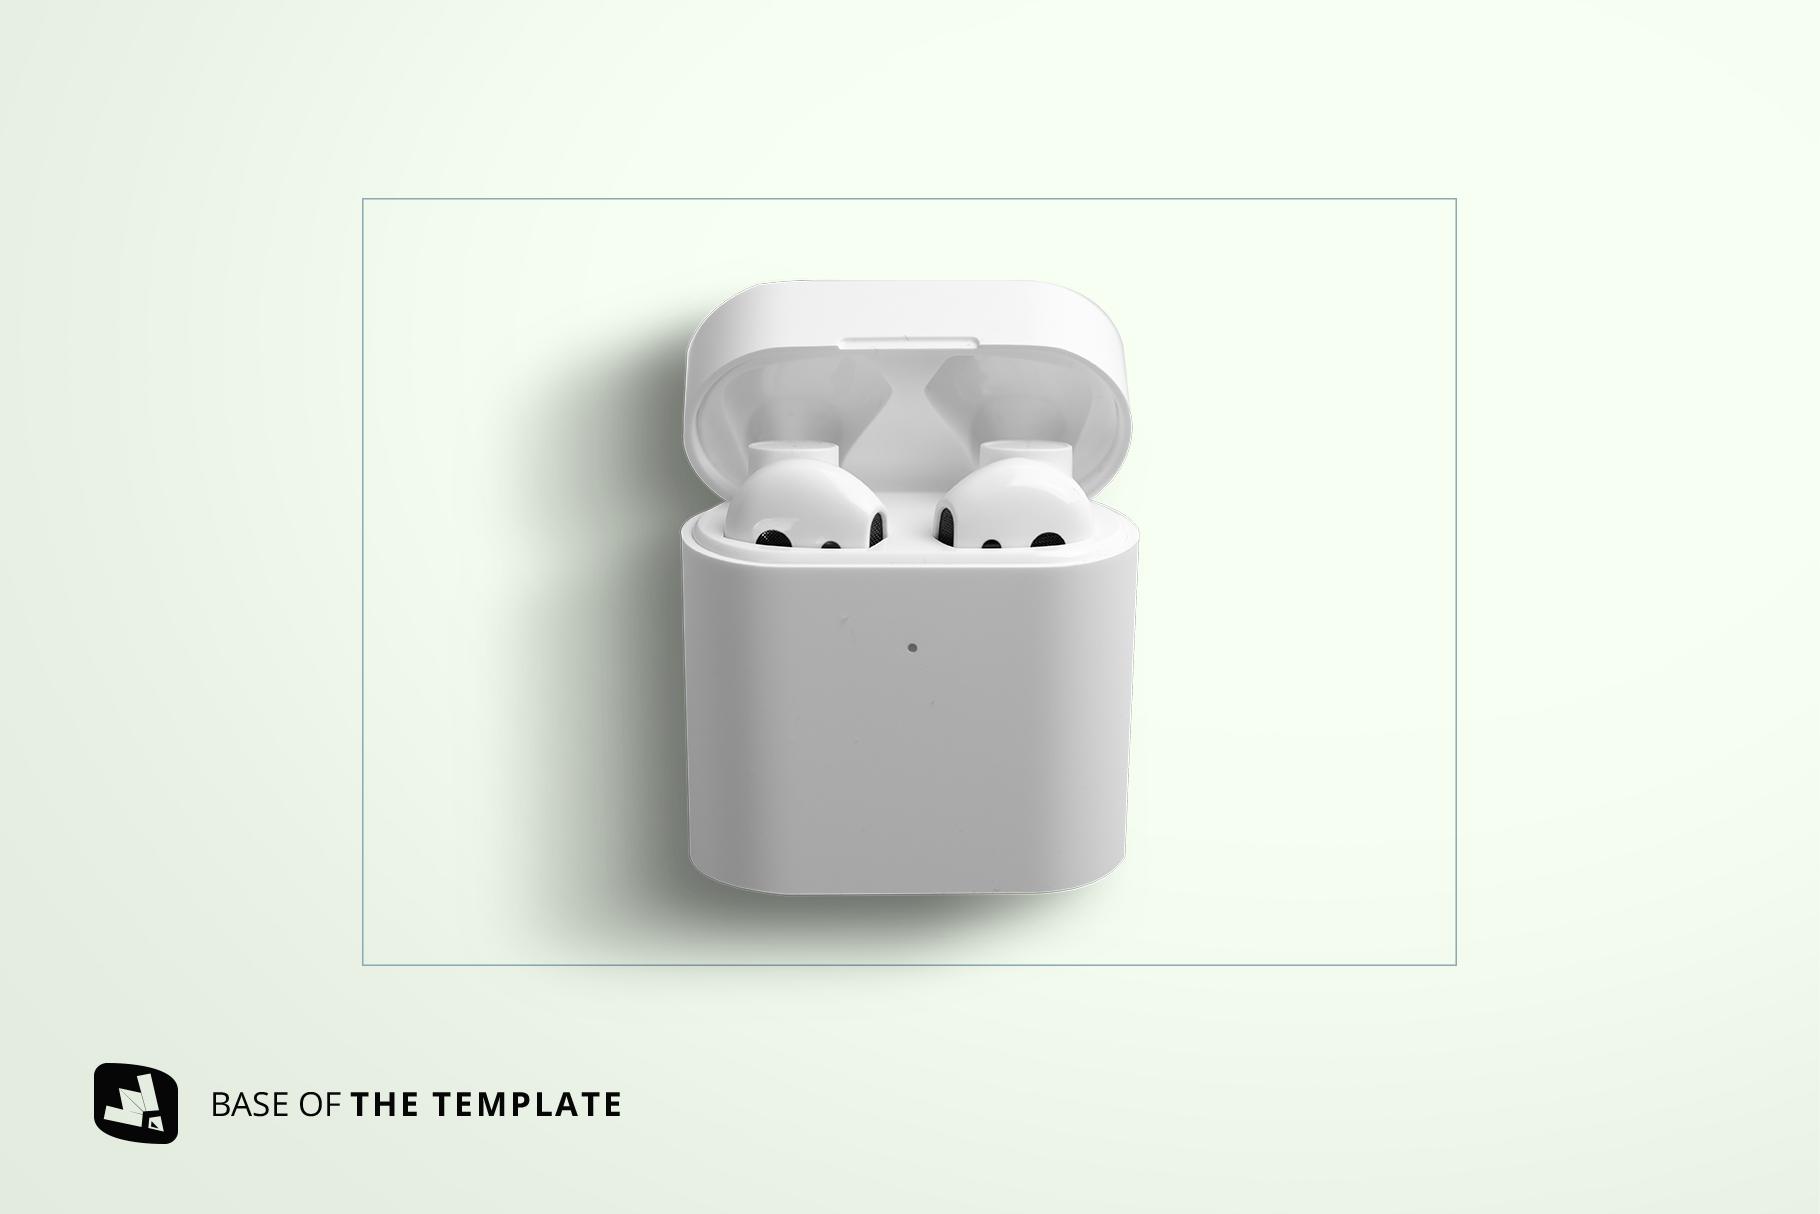 base image of the wireless earphone case mockup